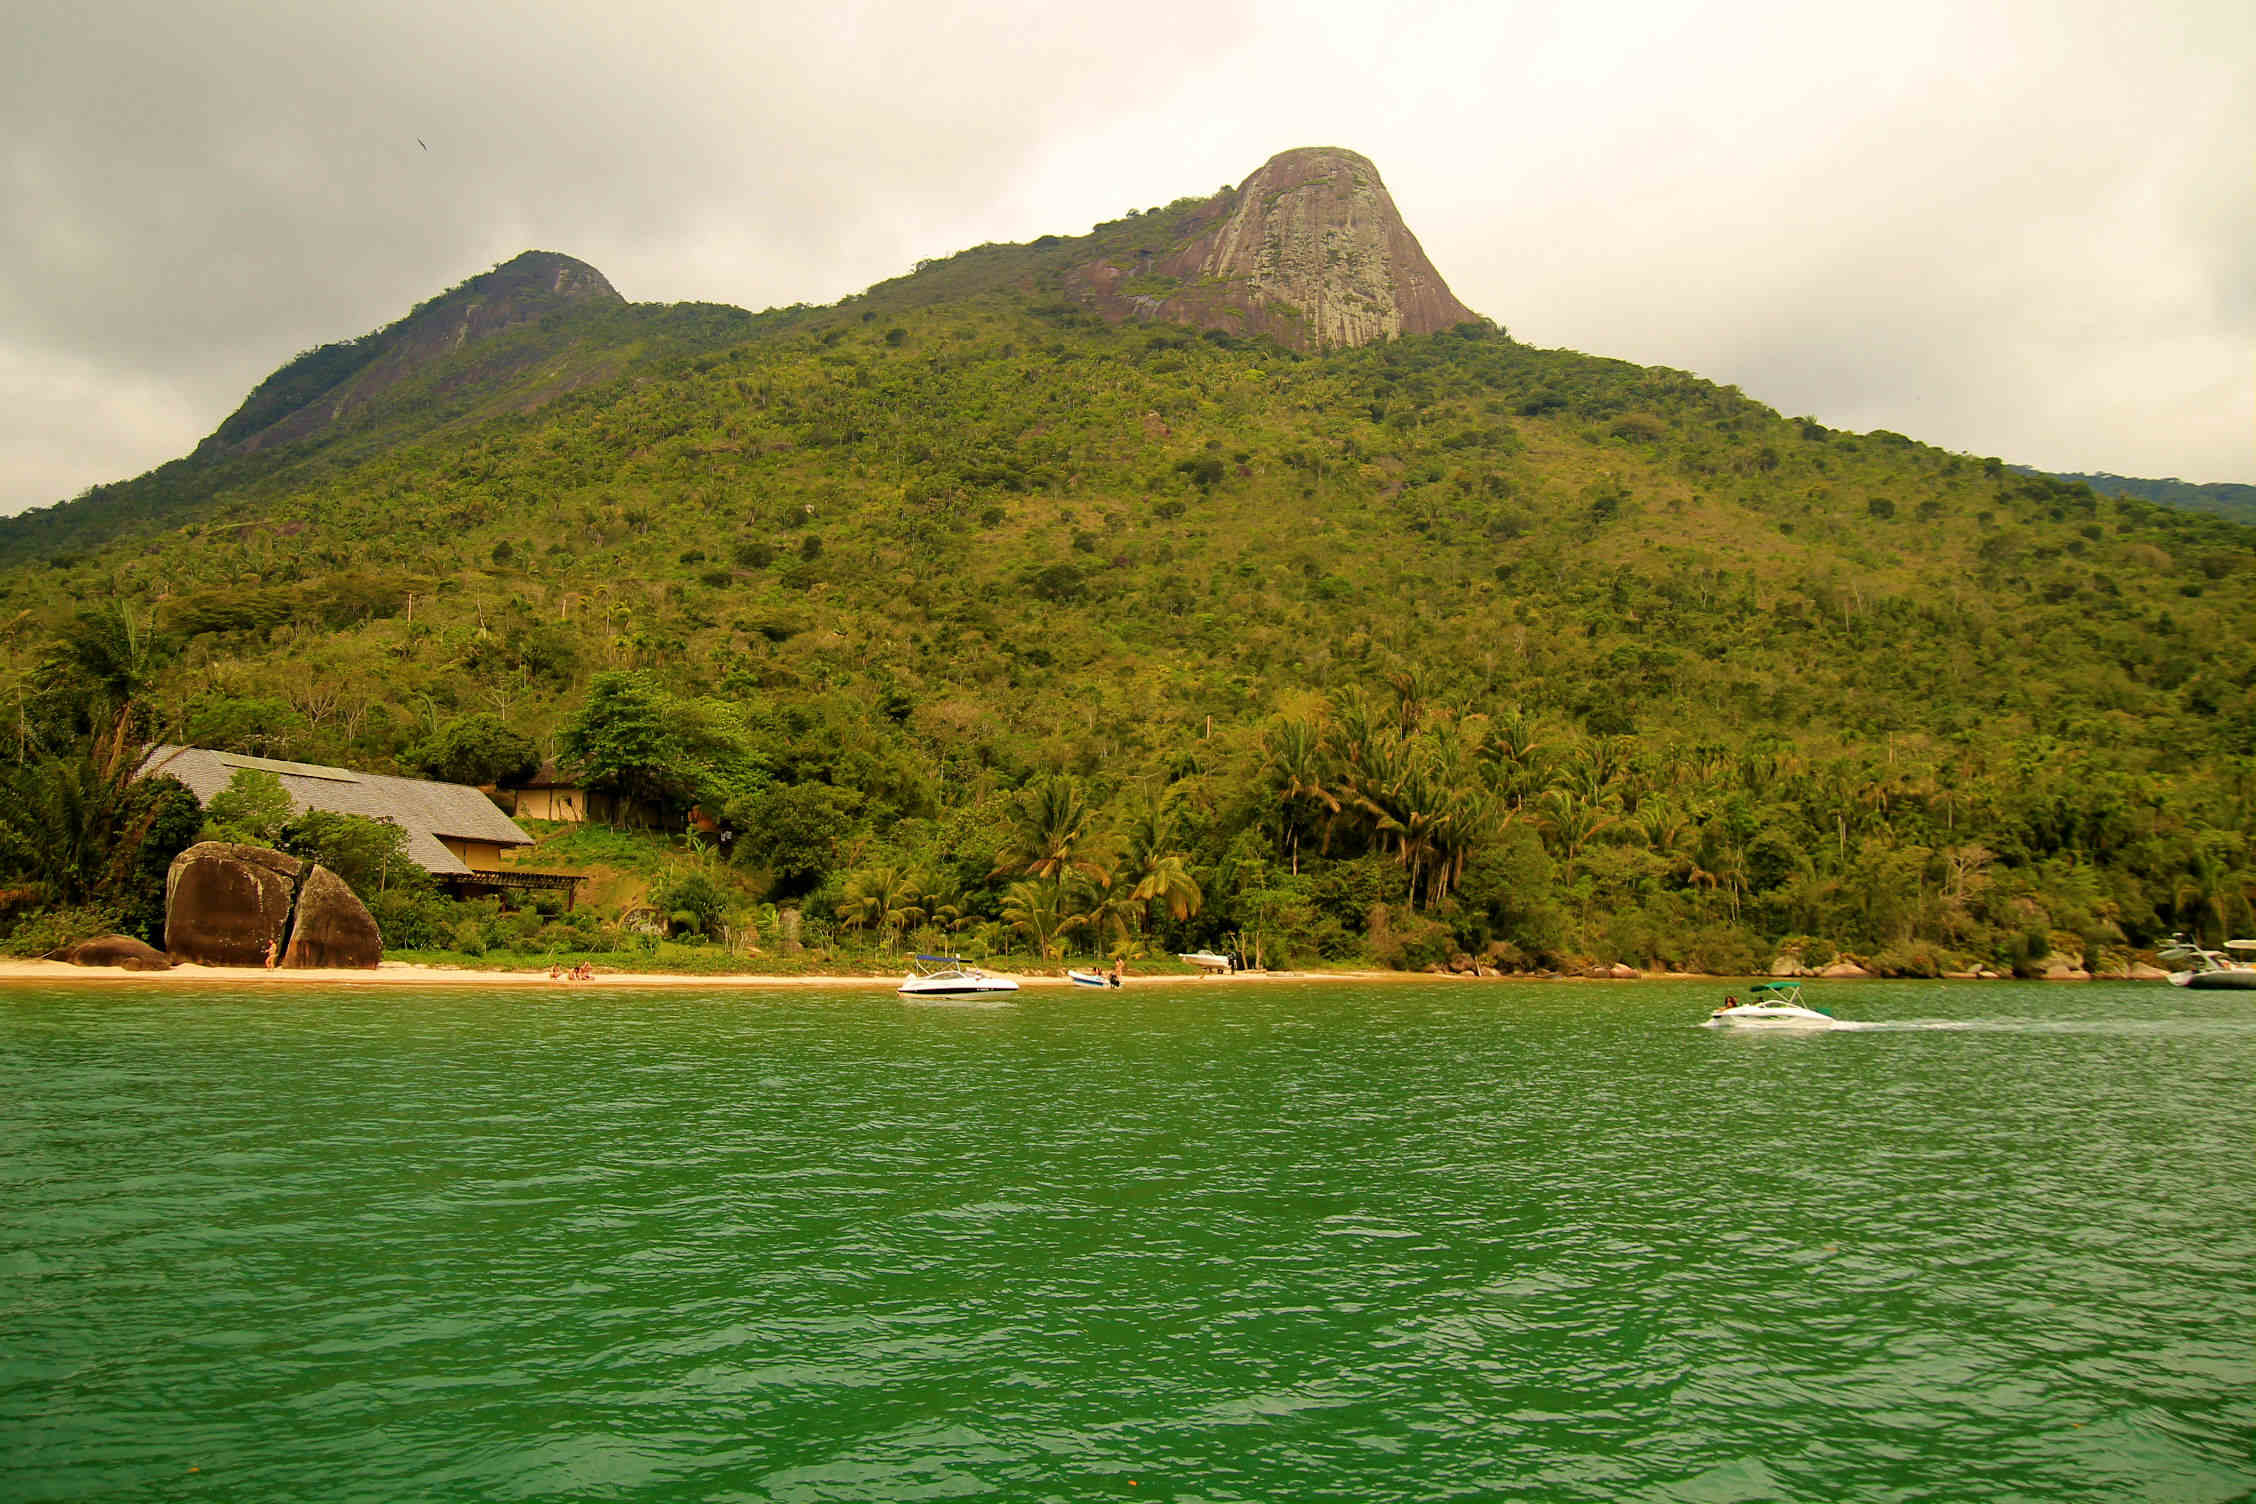 Passeio de barco pelas praias de Paraty (Foto: Thaís Sabino)